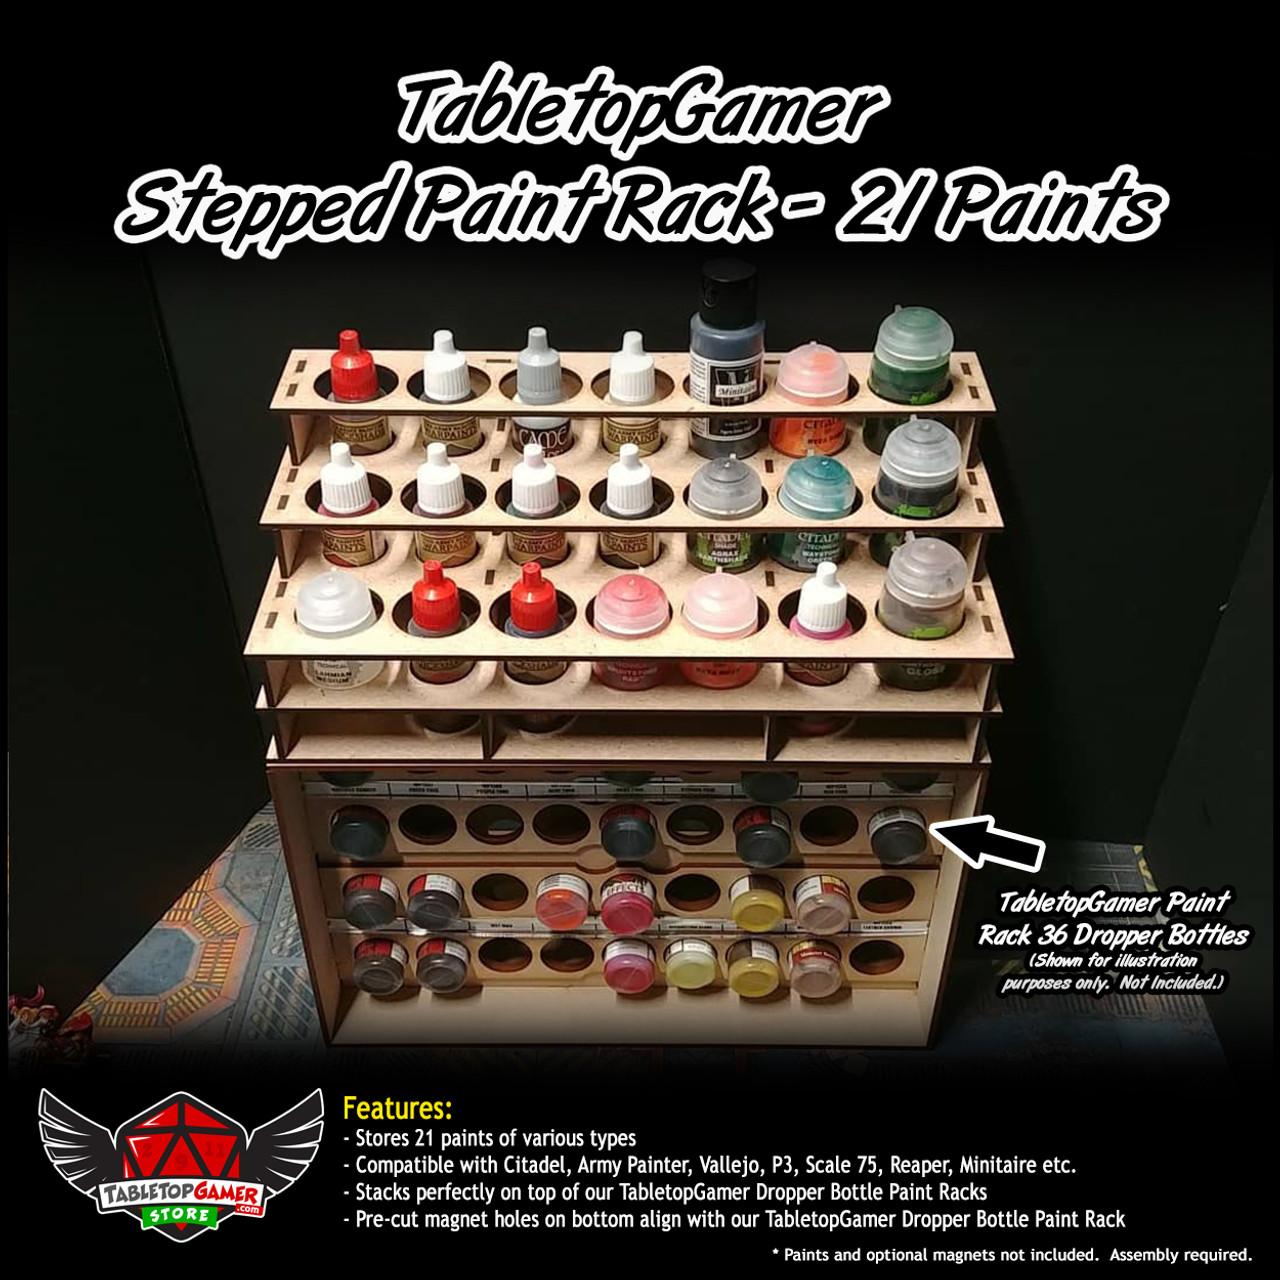 TTG Modular Stepped Universal Paint Rack - 21 Paints